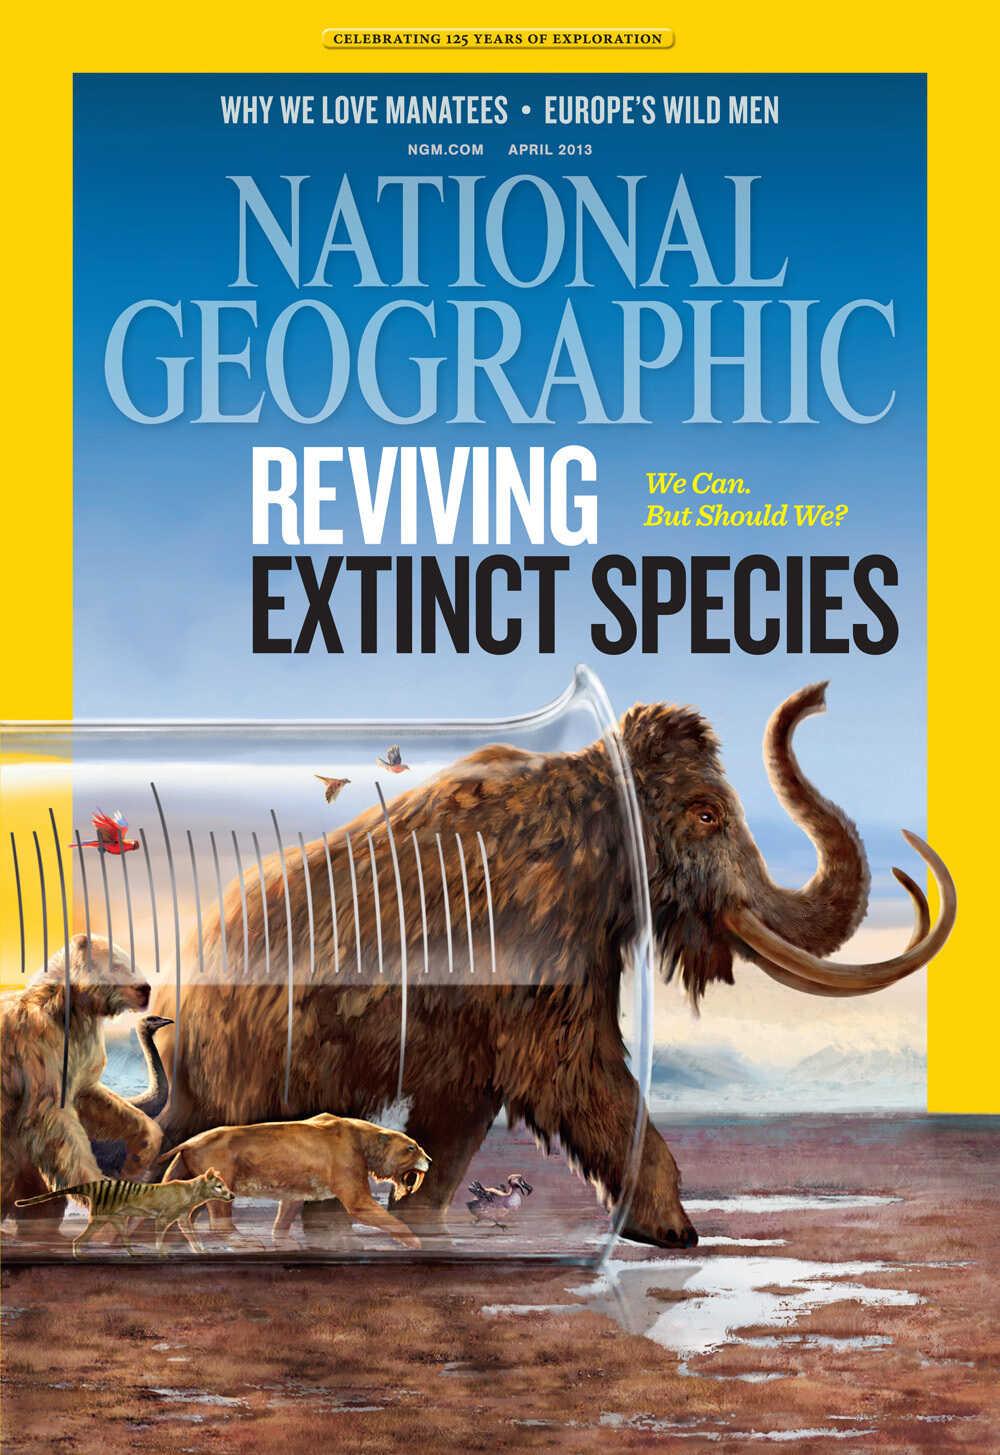 National Geographic Magazine, April 2013